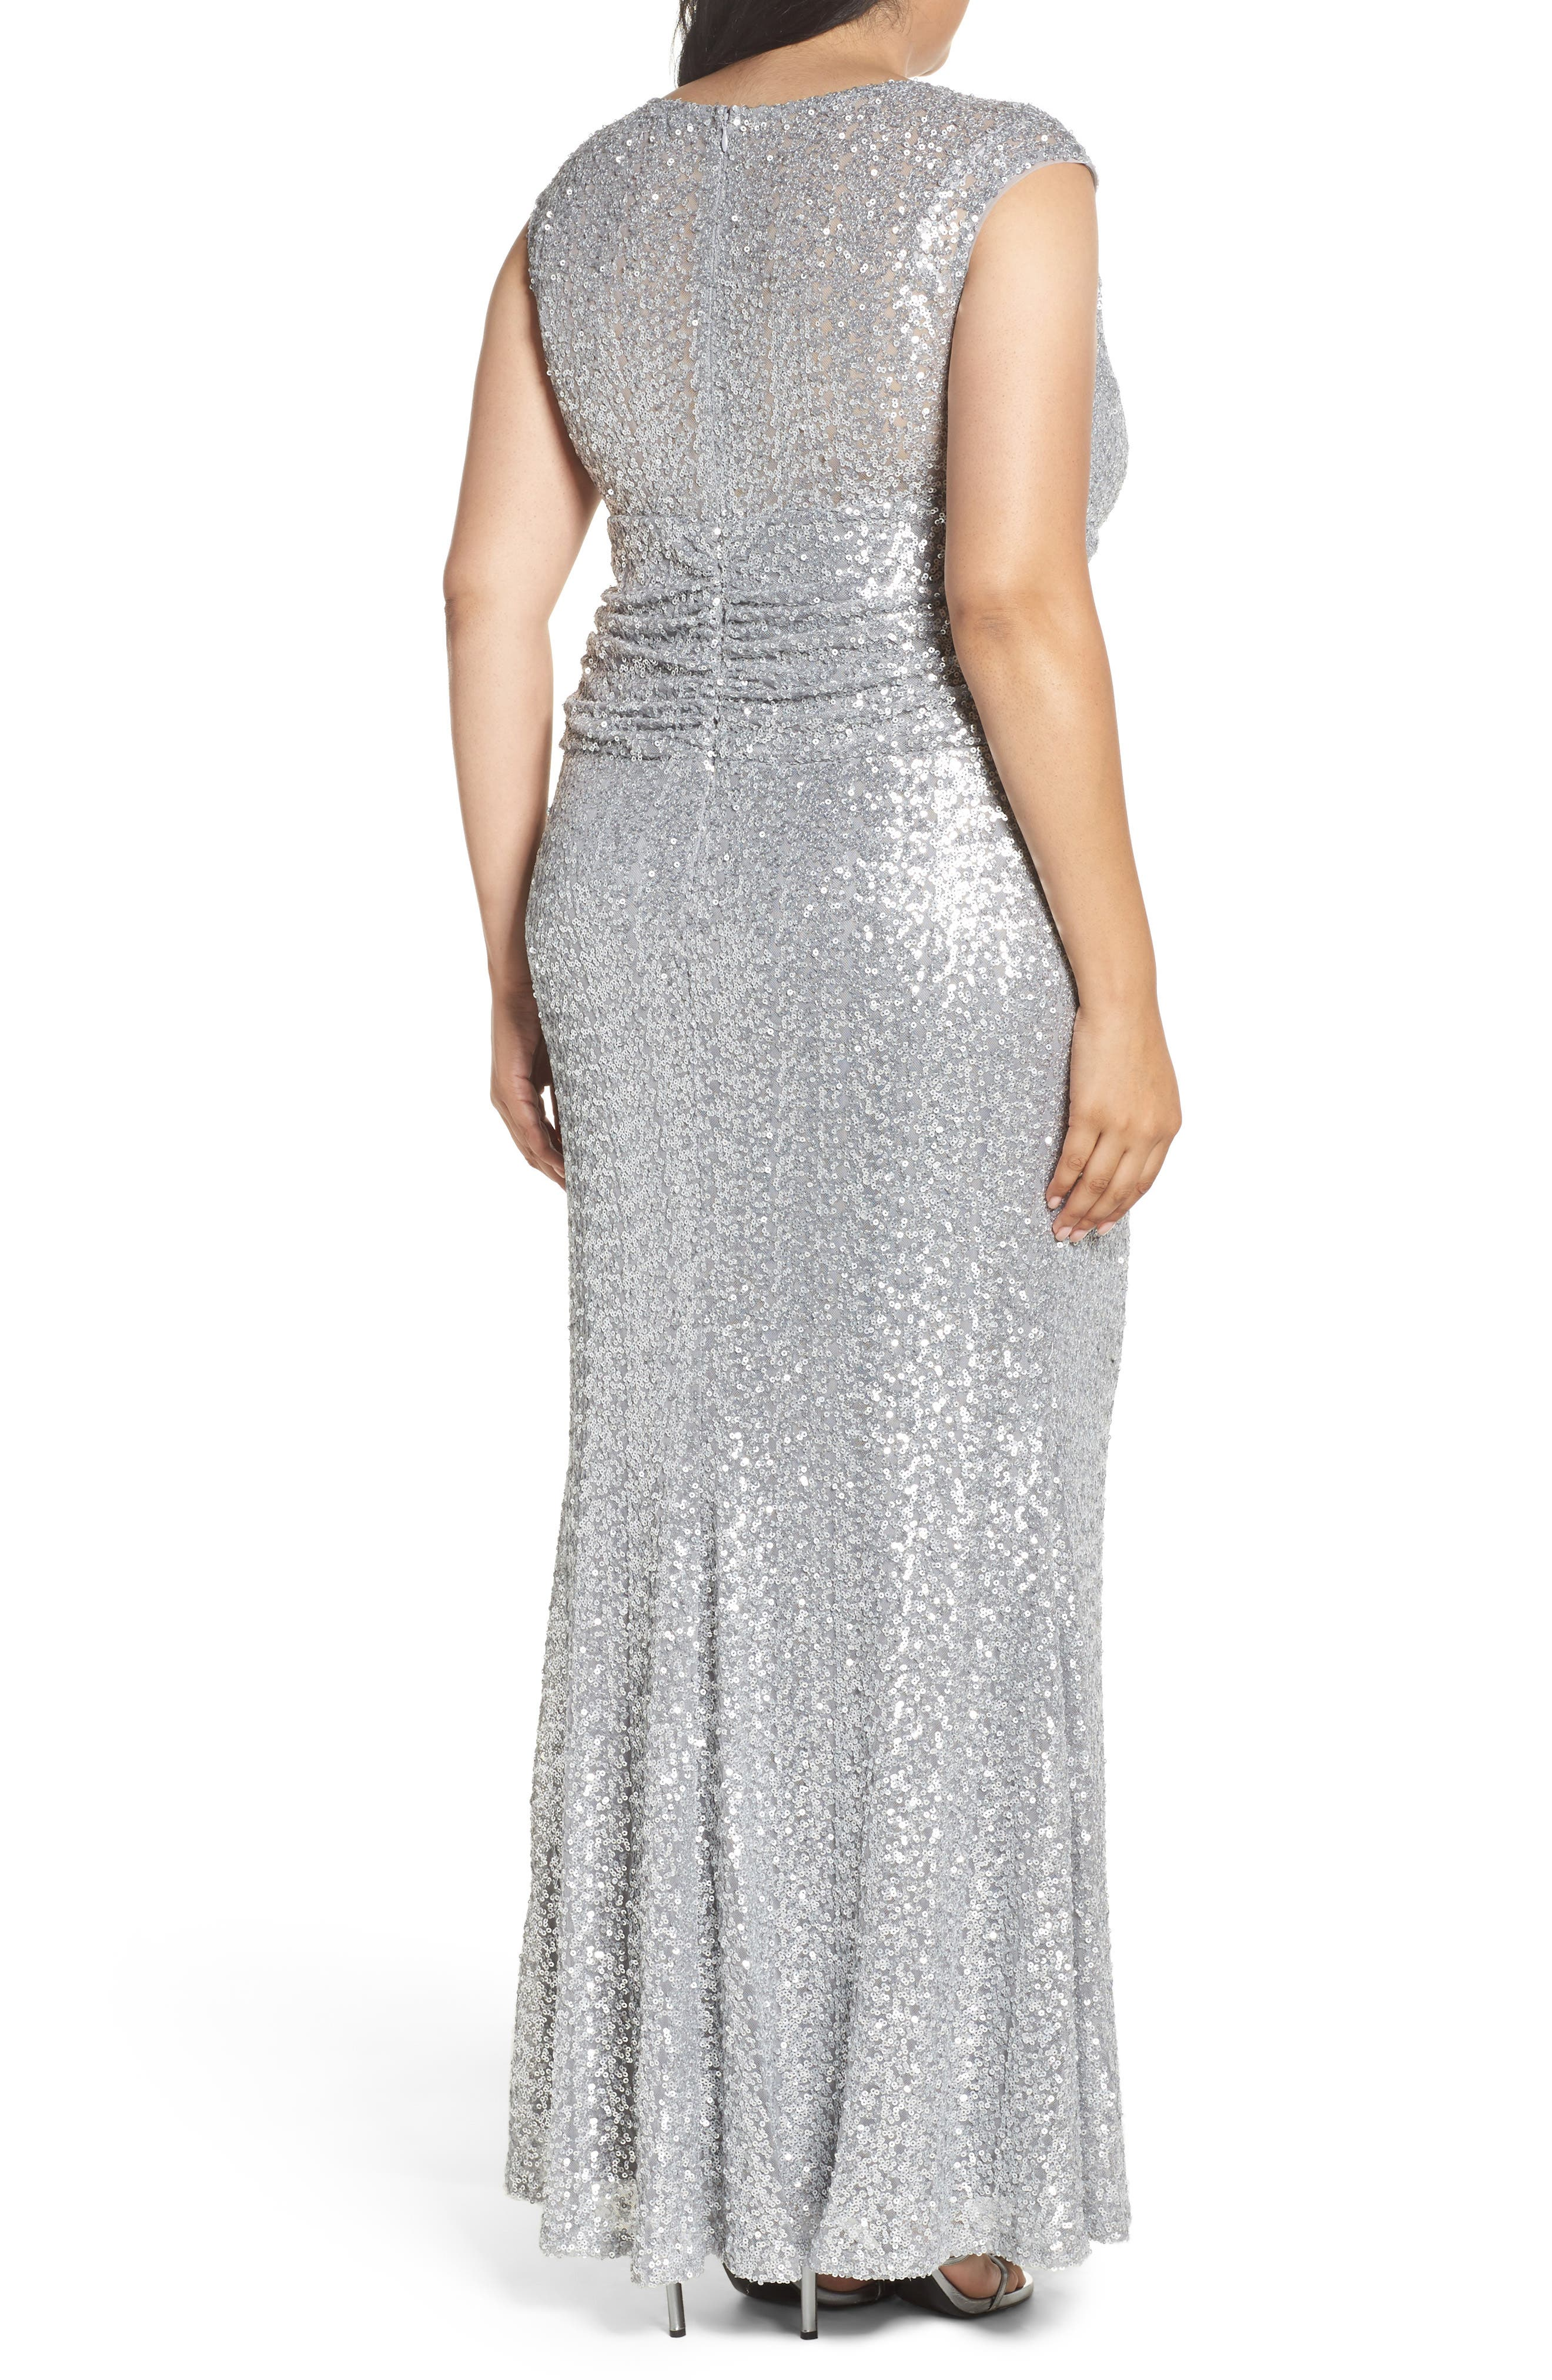 Alternate Image 2  - Marina Cutout Sequin Lace Gown (Plus Size)